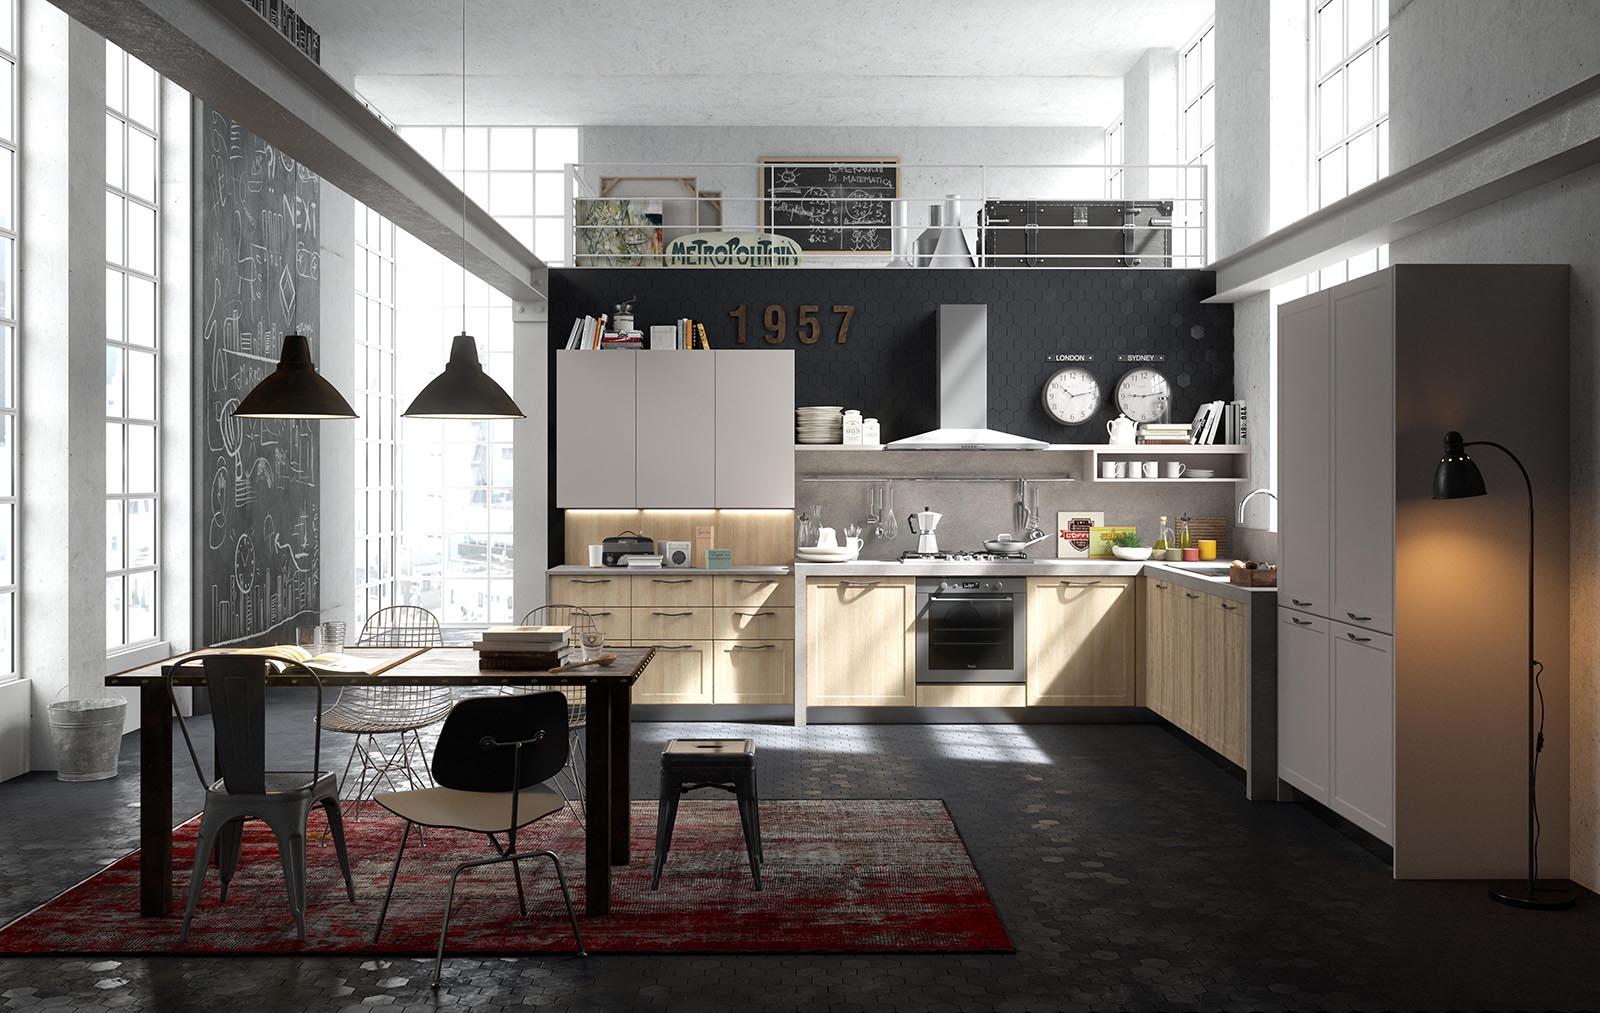 Emejing Cucine Industriali Per Casa Images - Home Design Ideas ...